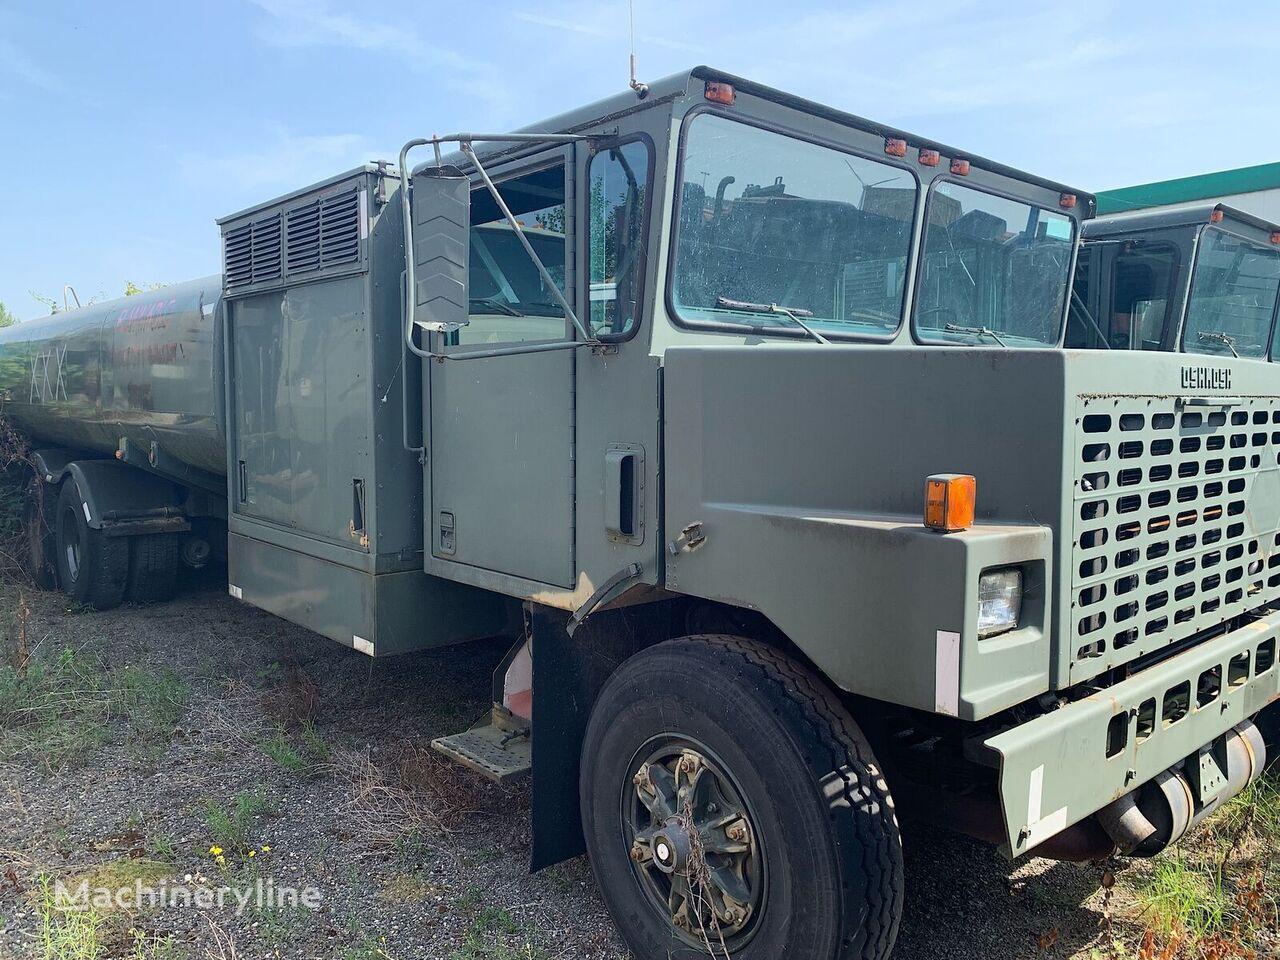 Oskosh Tank truck. Airport Tanker 3 meter wide andere Flughafenfahrzeuge